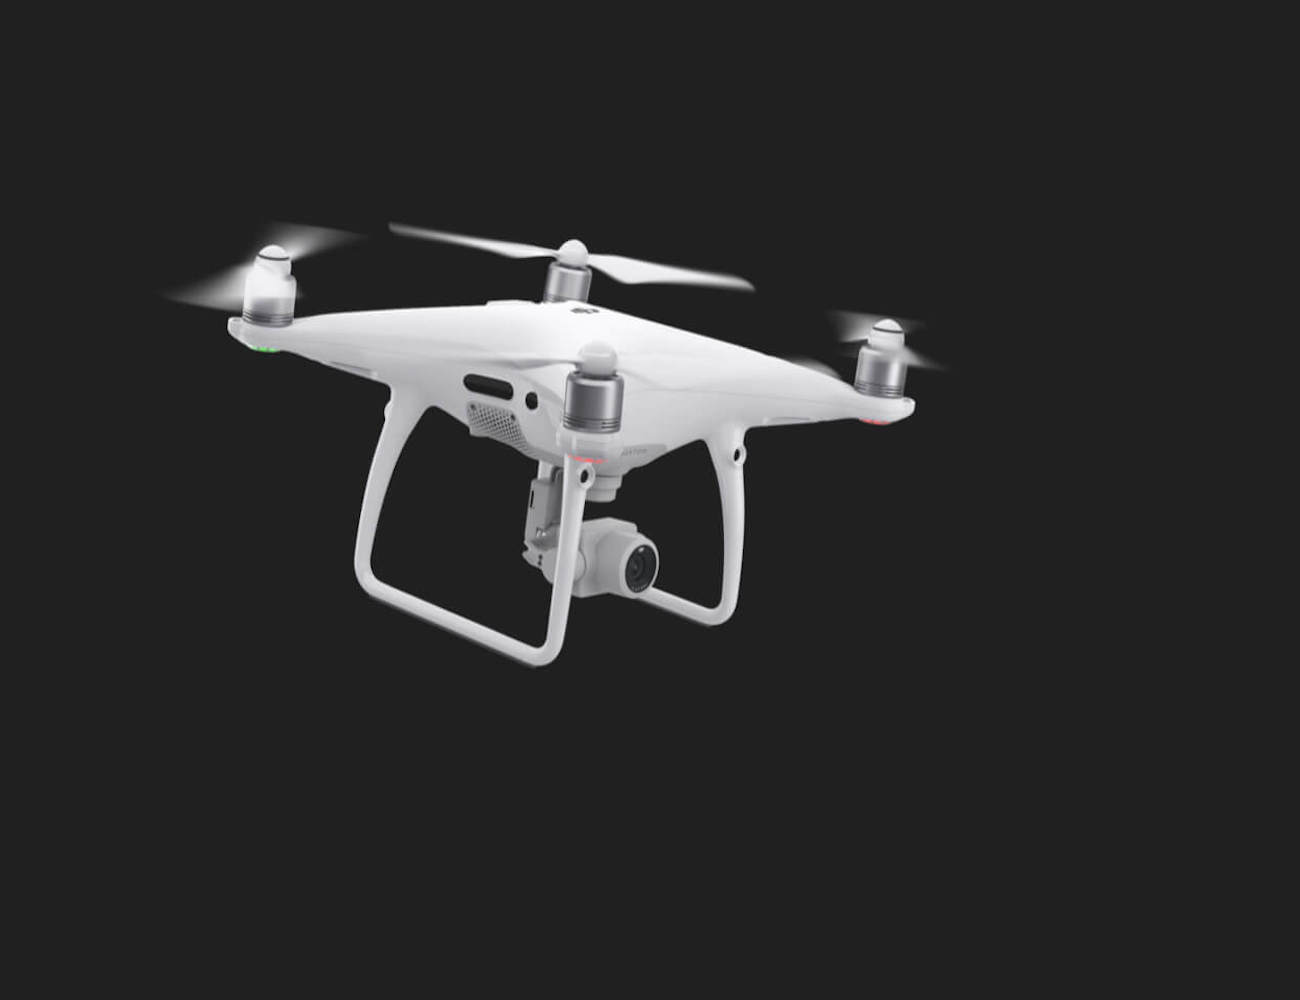 DJI Phantom 4 Pro Aerial Filmmaking Drone